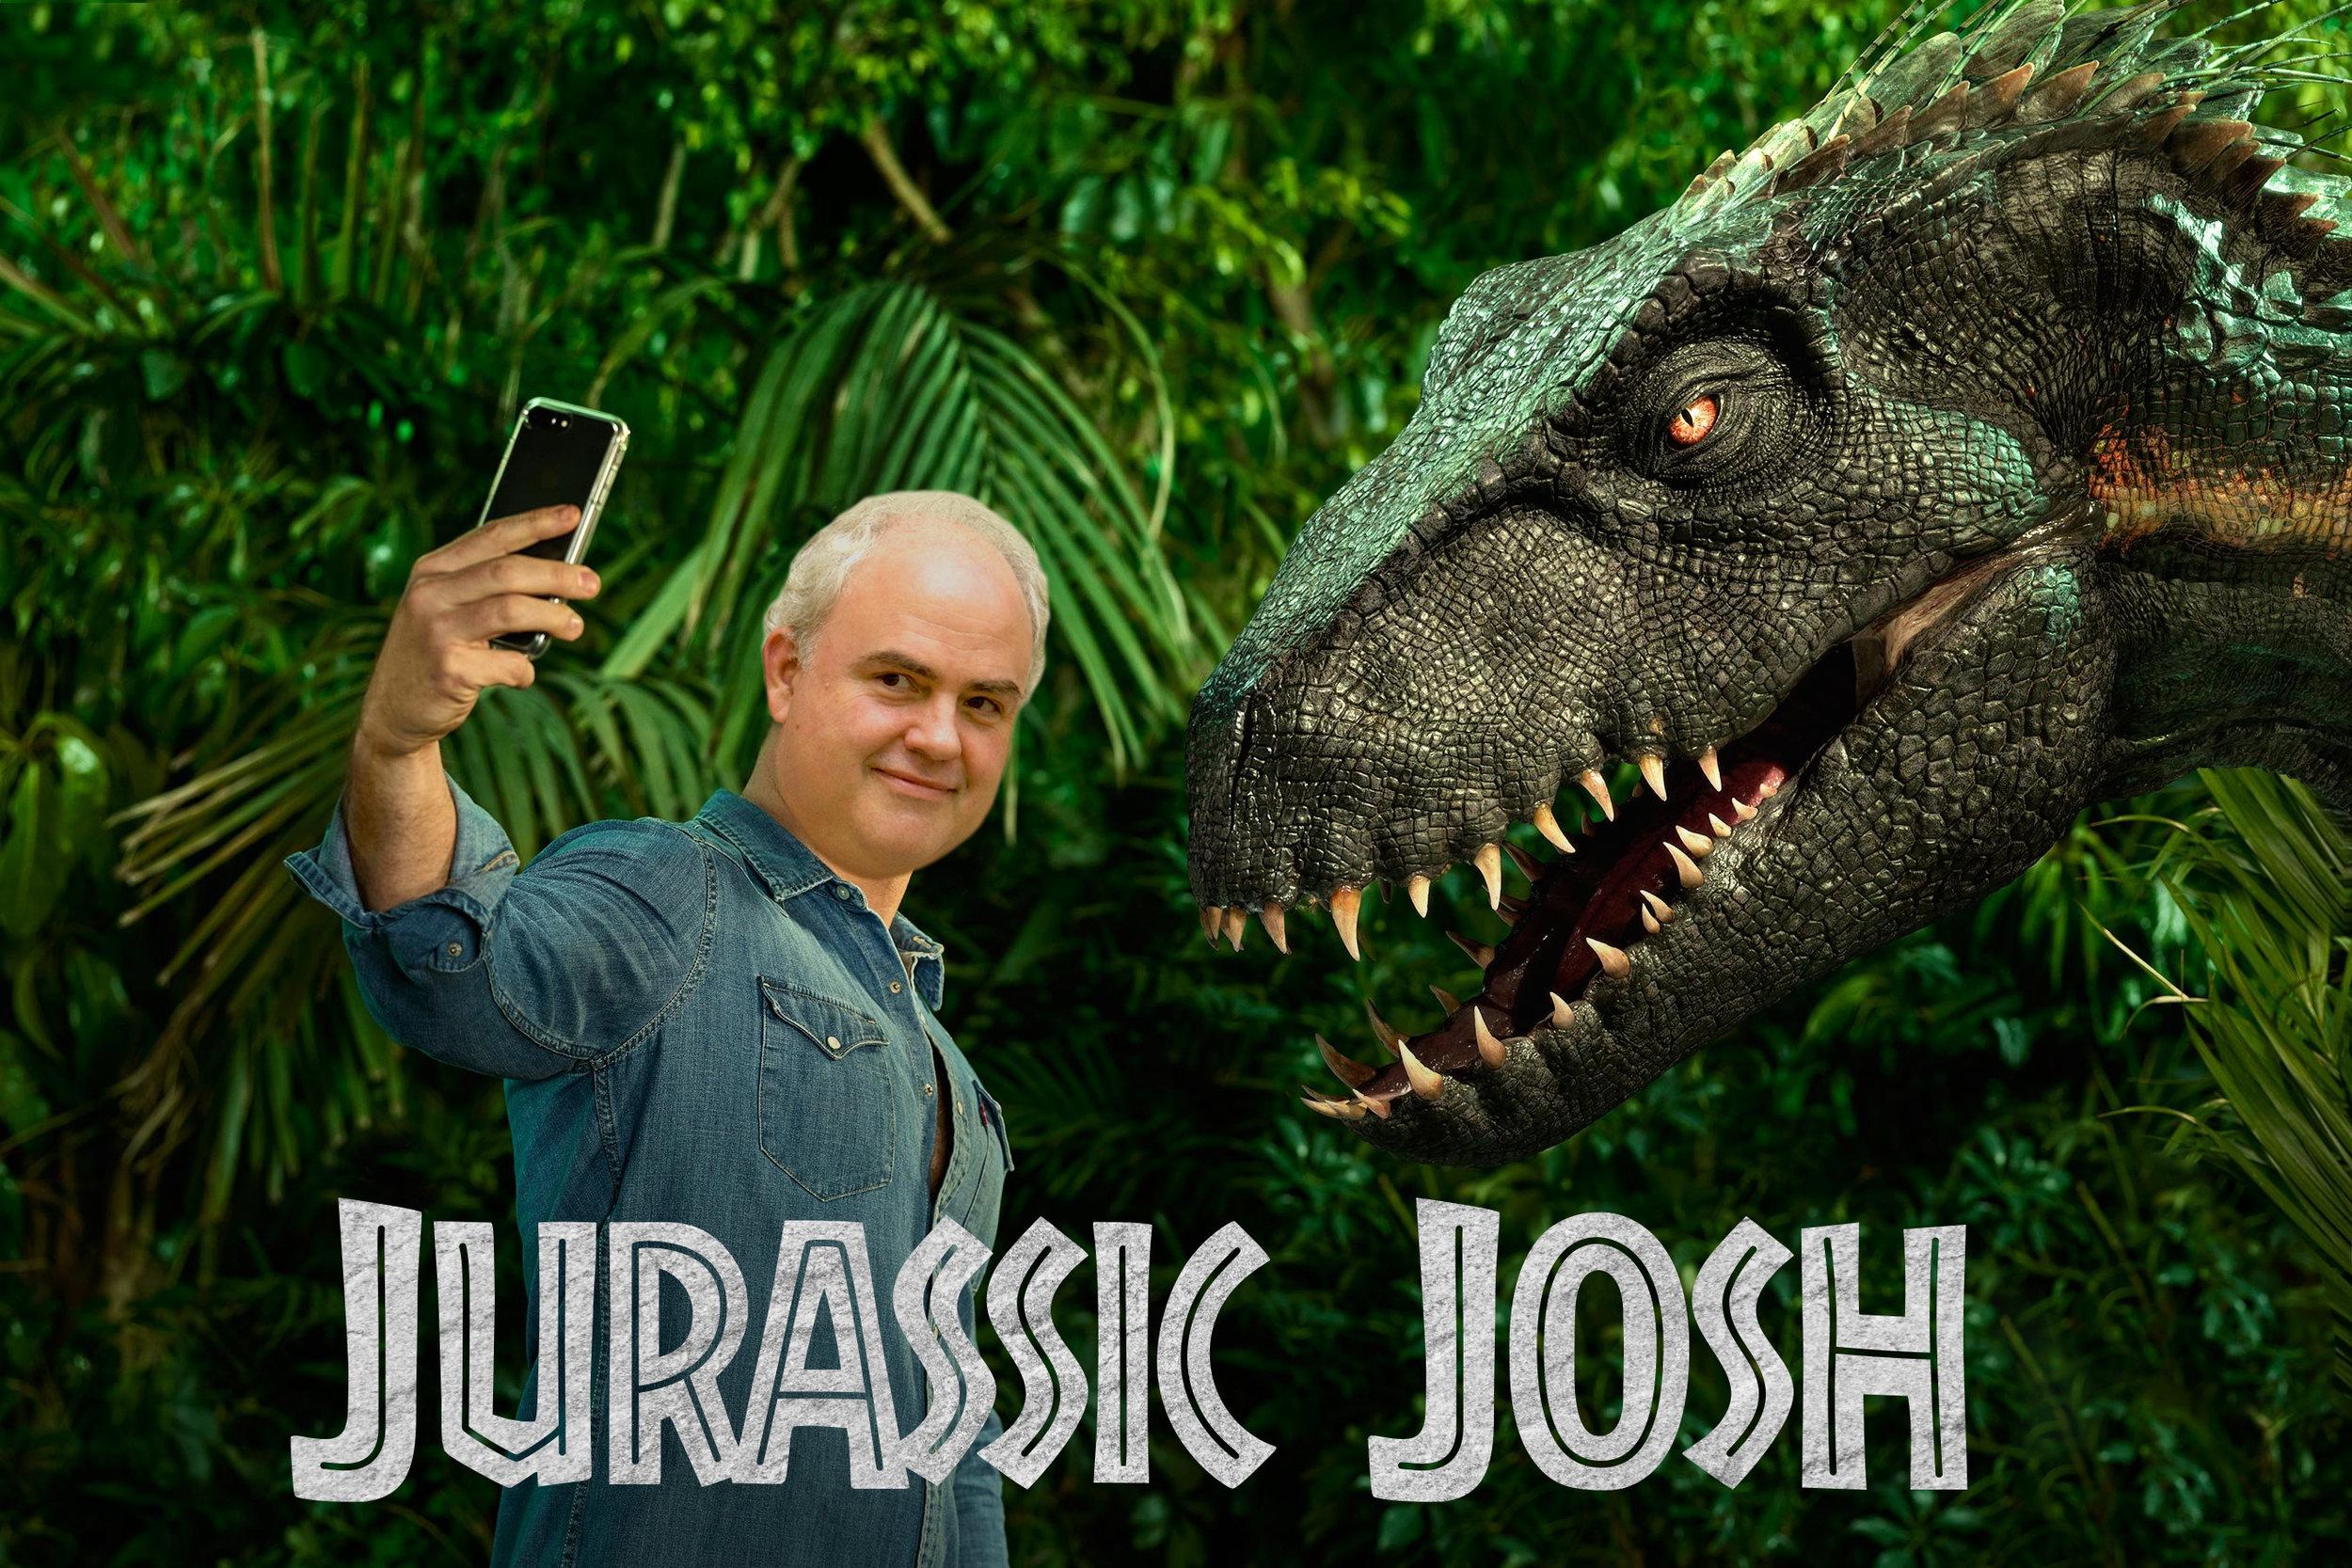 Jurassic-Josh.jpg